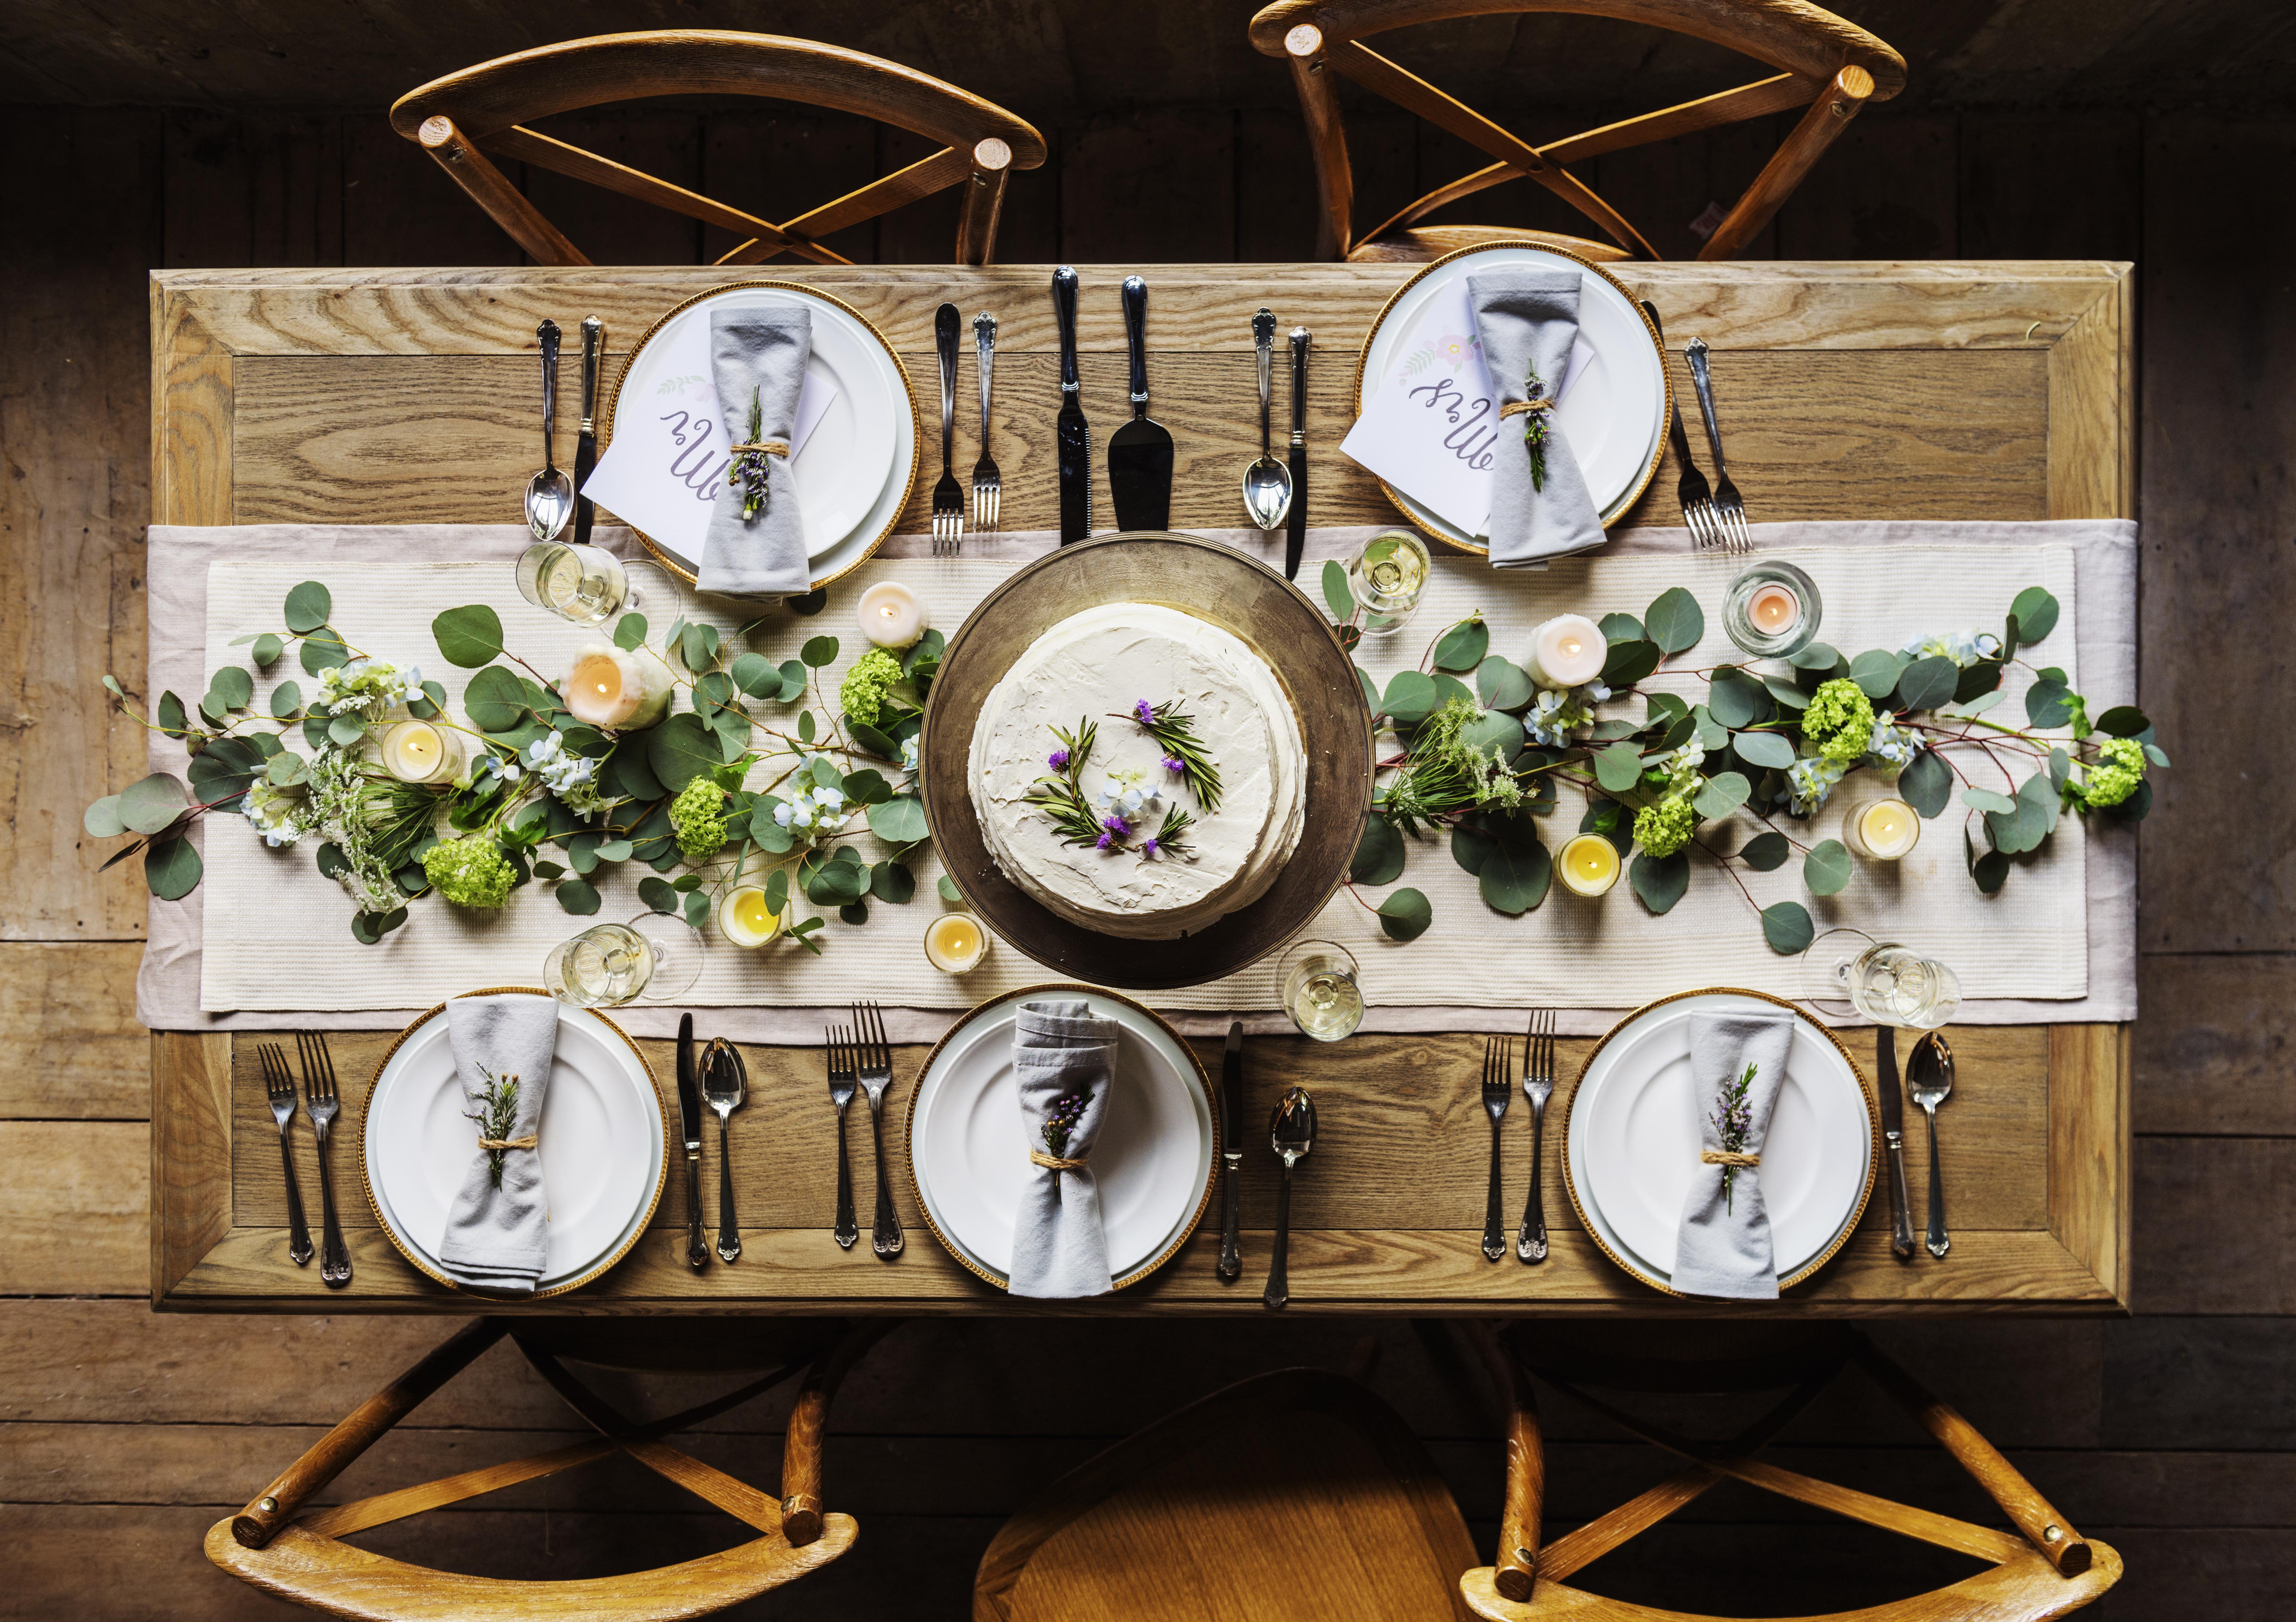 Elegant Restaurant Table Setting Service for Reception